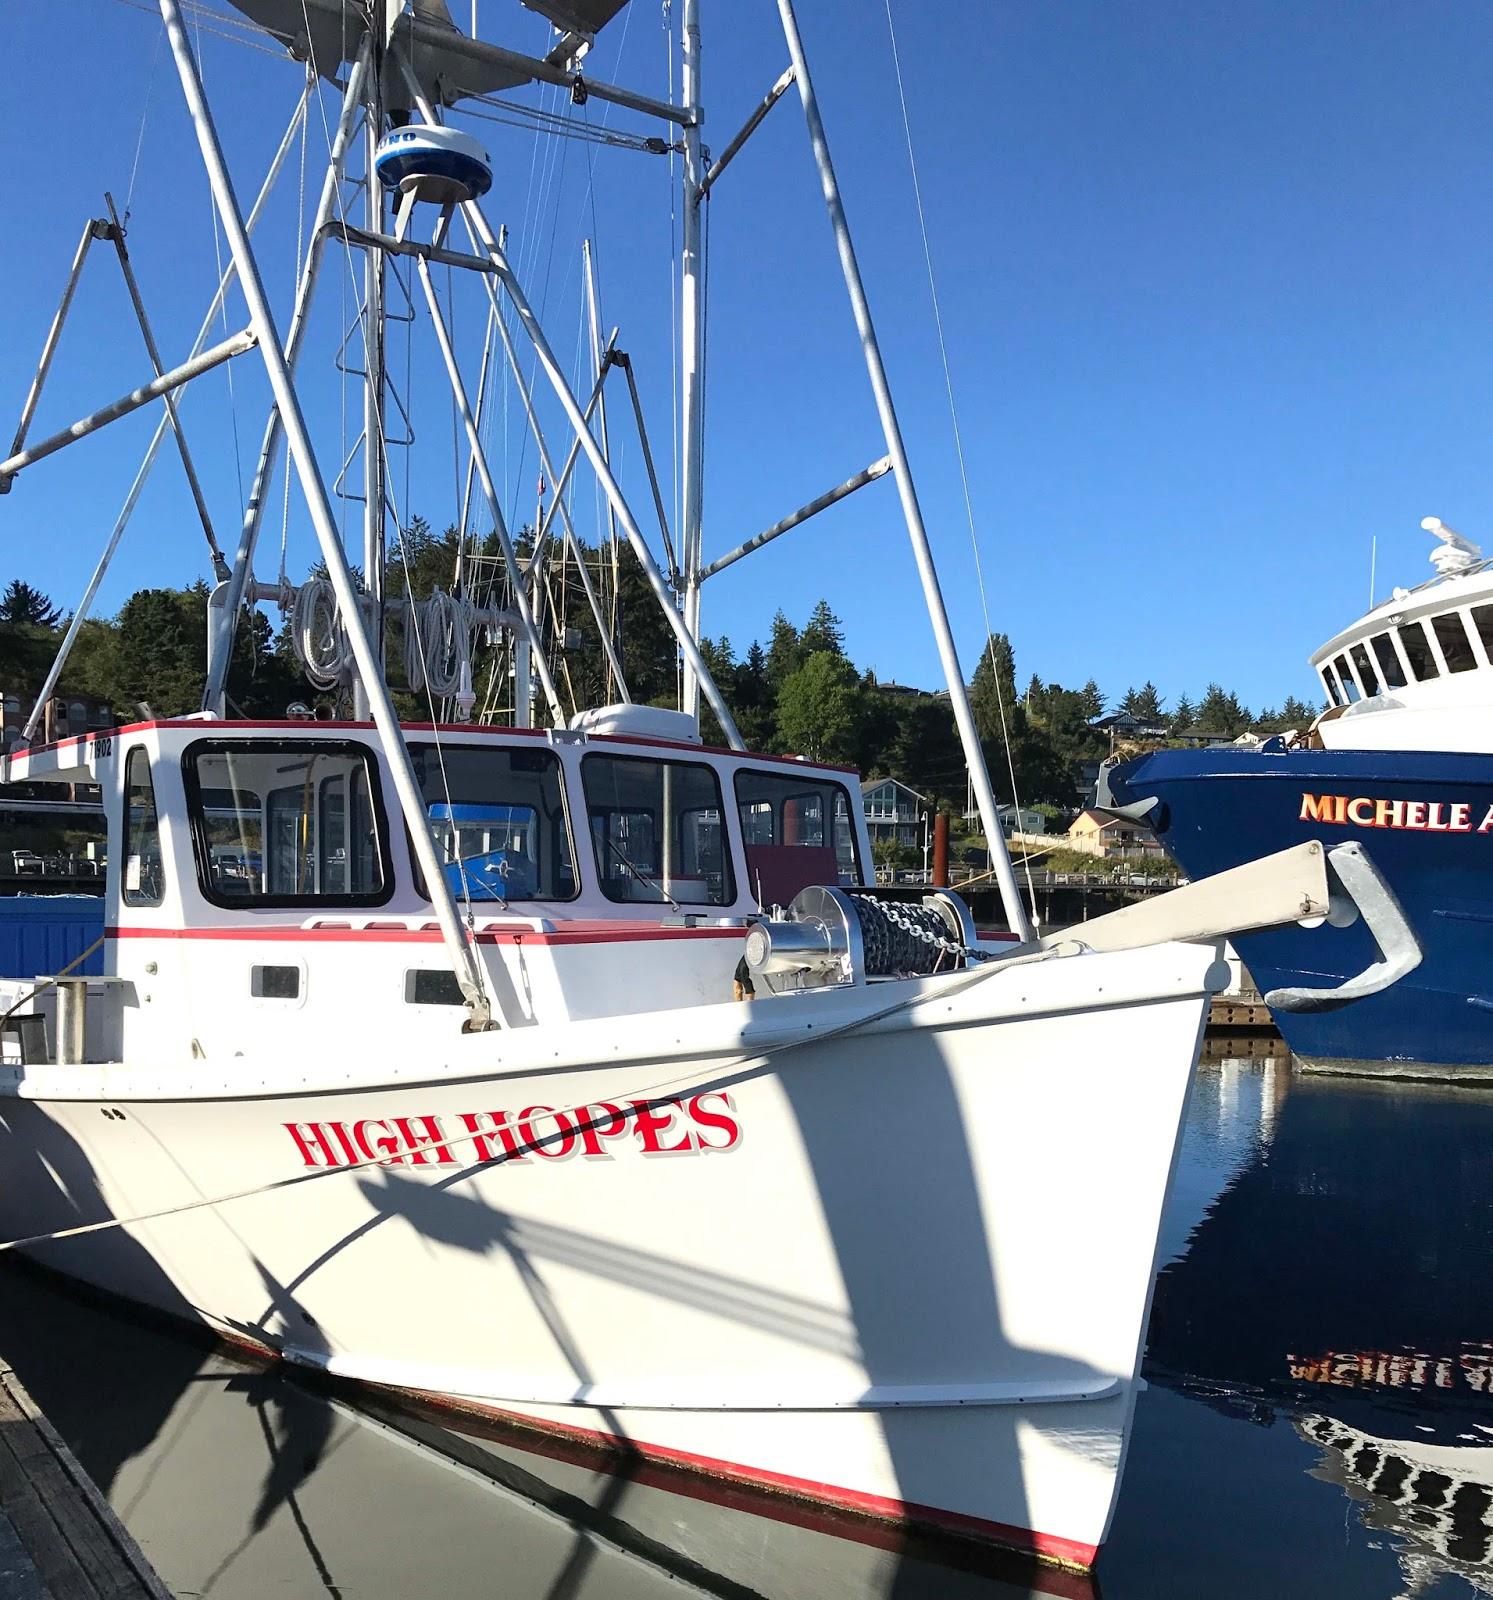 Yaquina bay boats photo